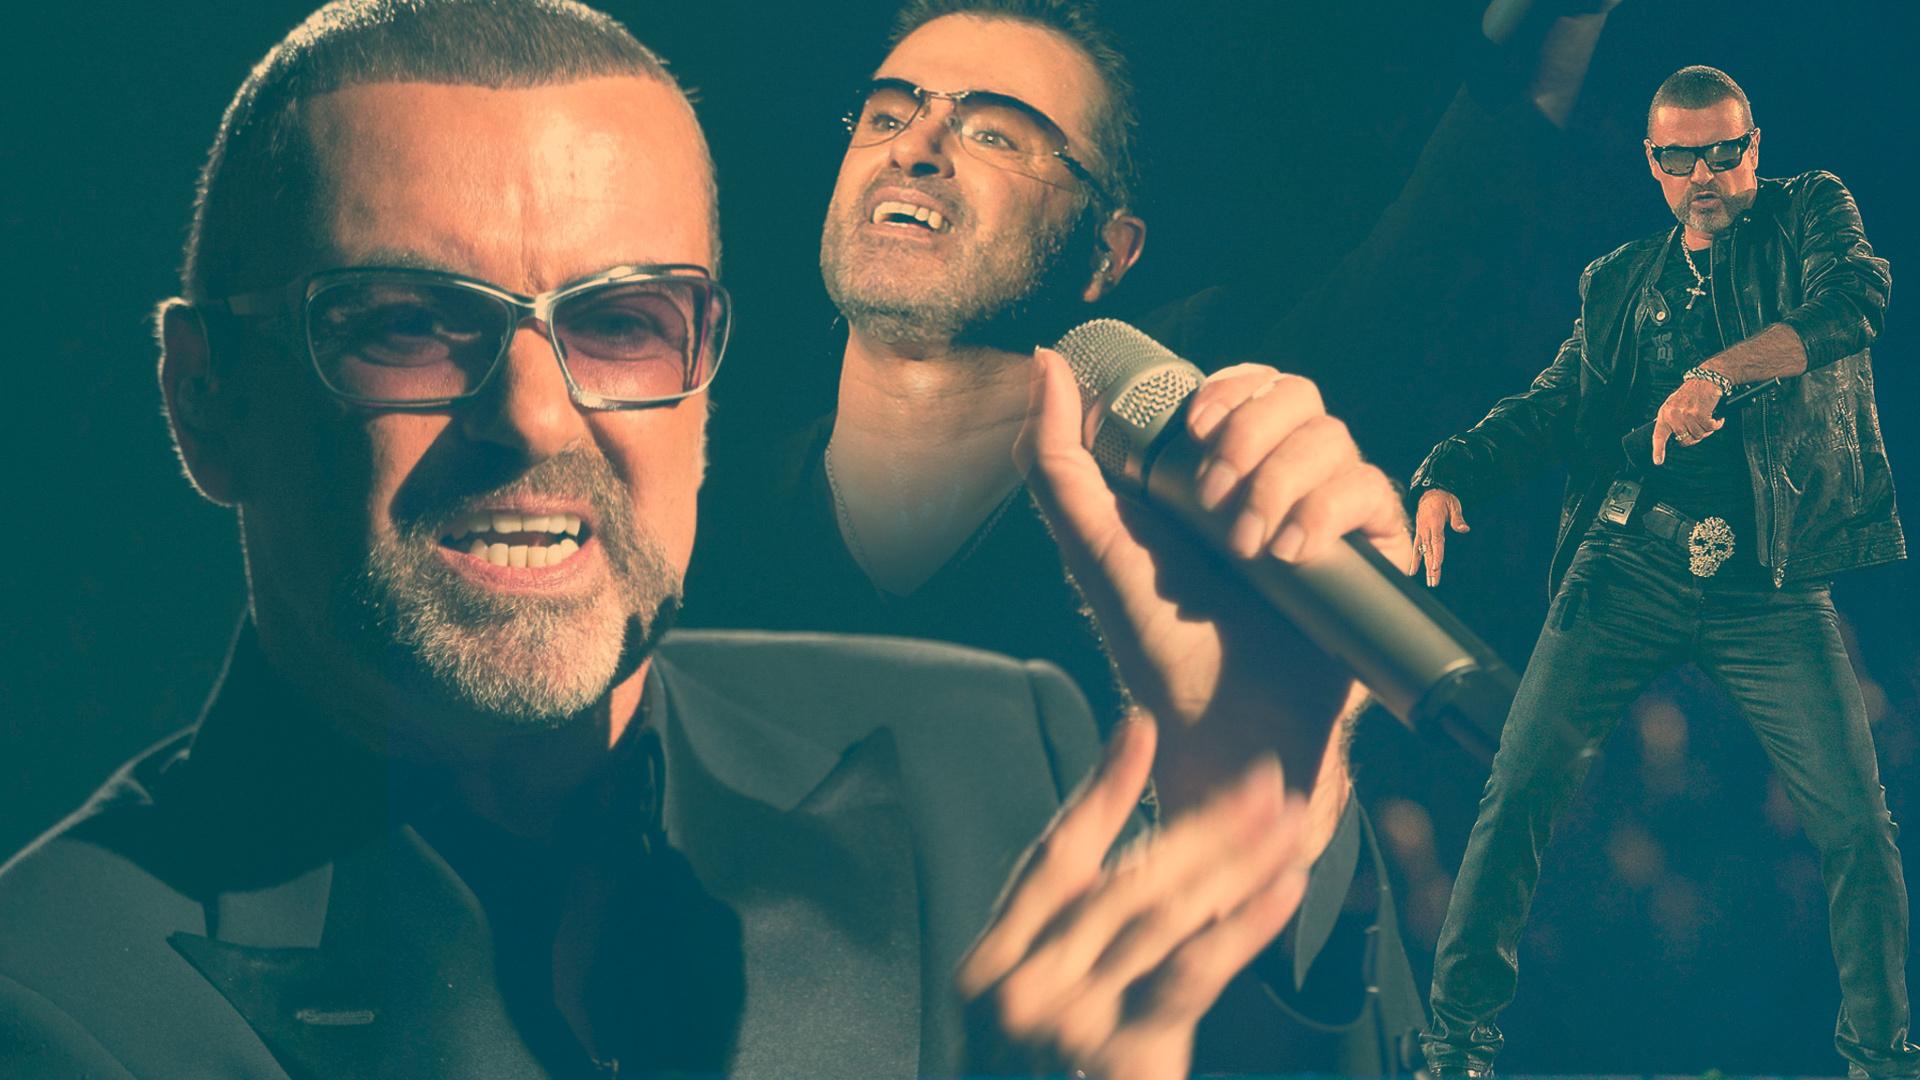 George Michael Hd Background